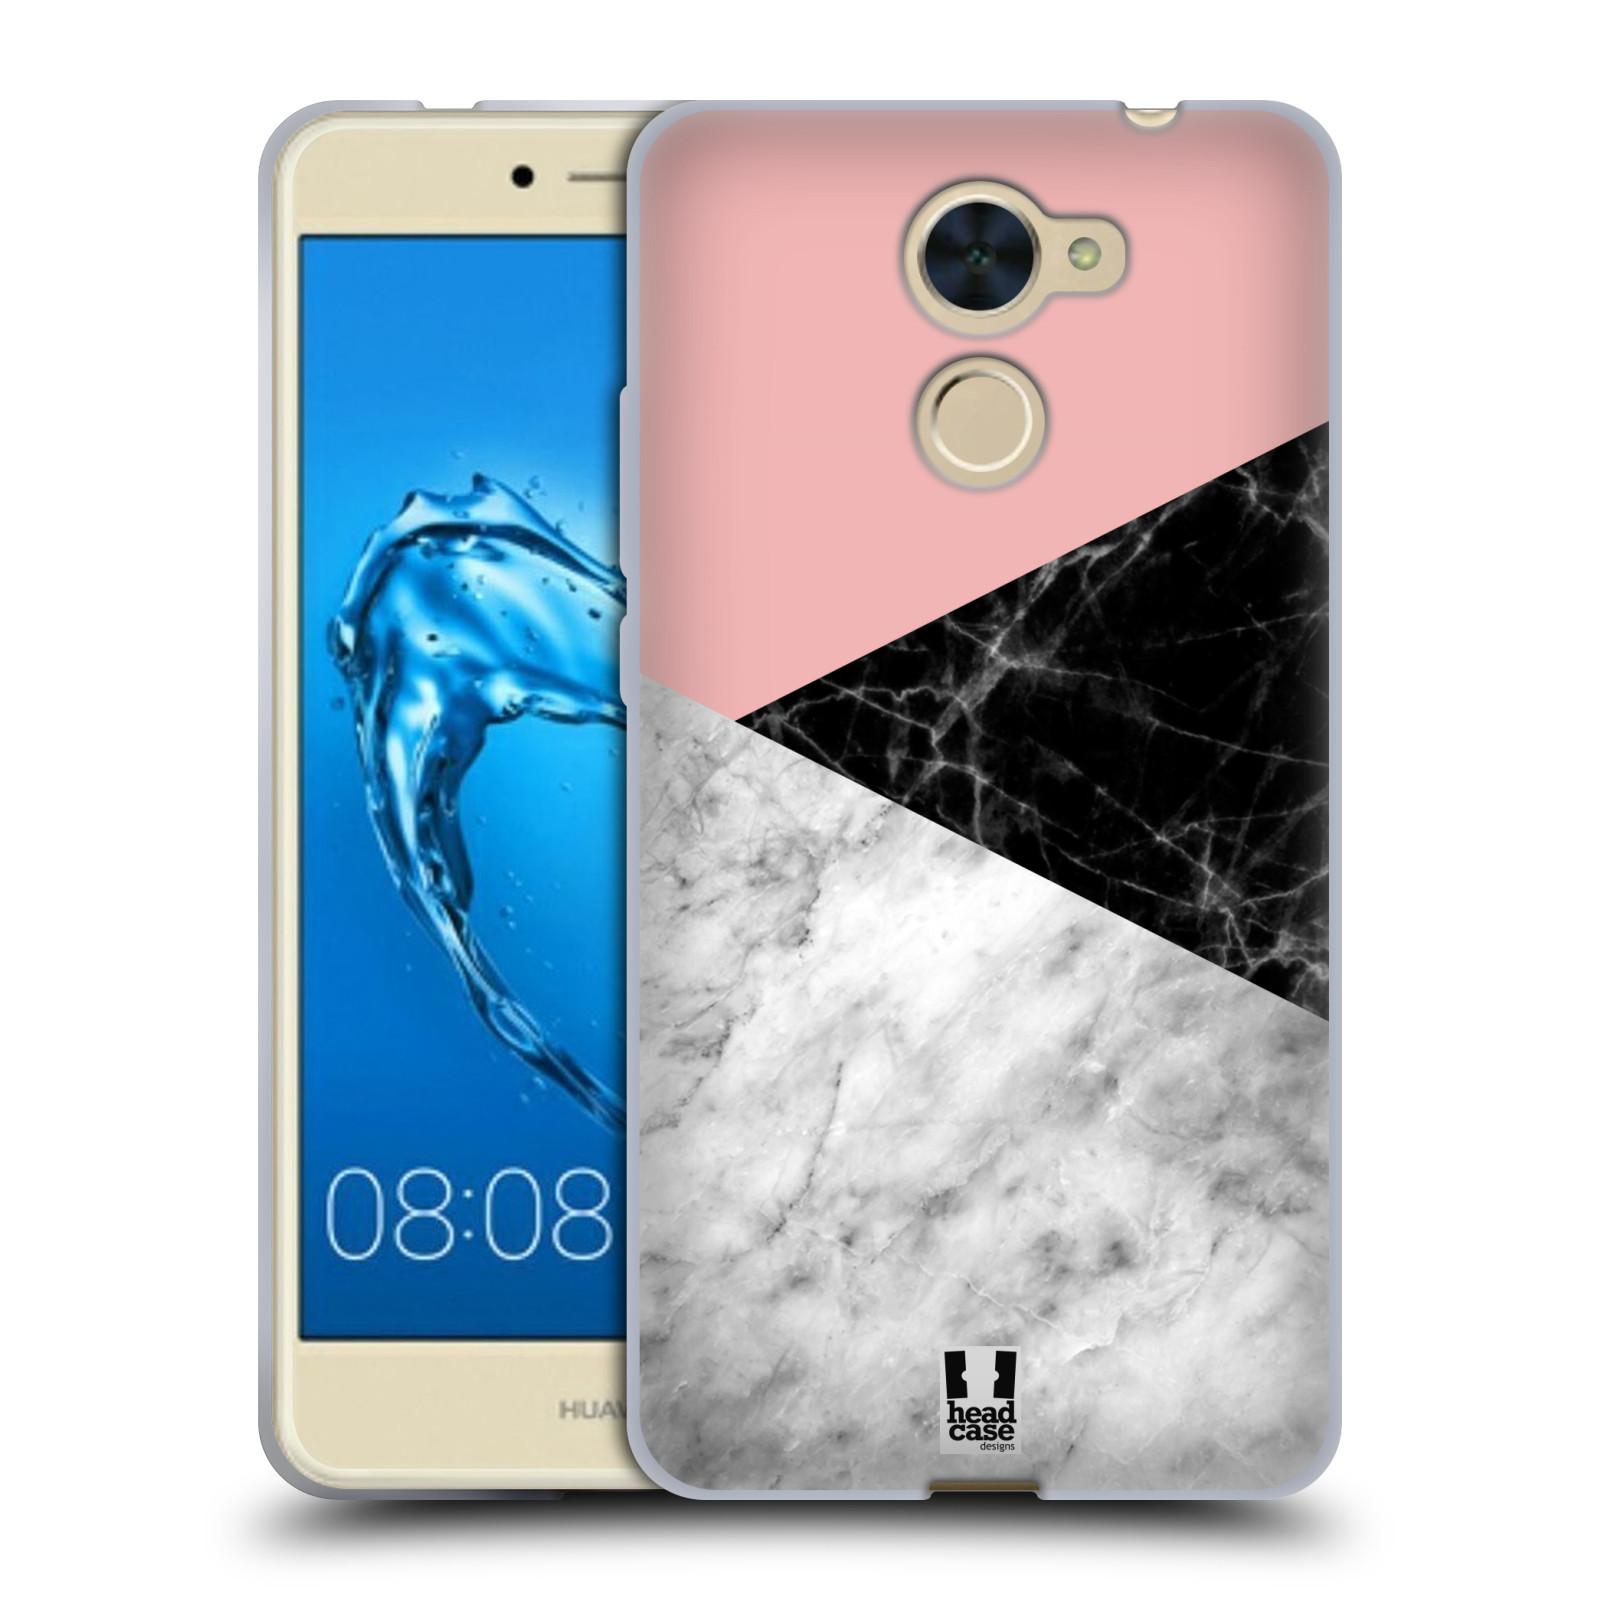 Silikonové pouzdro na mobil Huawei Y7 - Head Case - Mramor mix